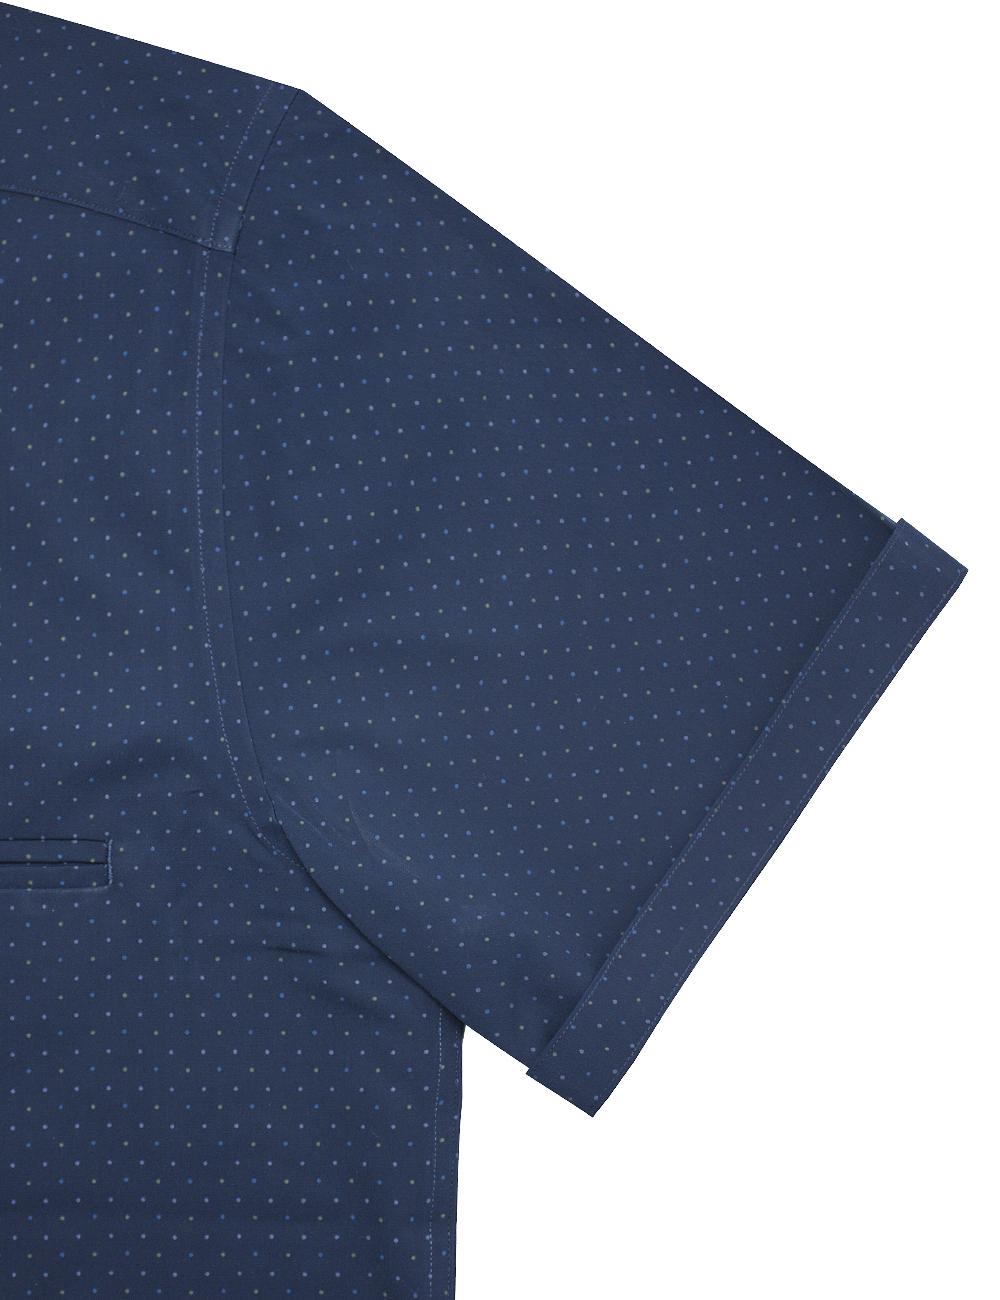 Navy Polka Dots Print Eco-ol Bamboo Custom / Relaxed Fit Short Sleeve Shirt - RF9SNB3.21